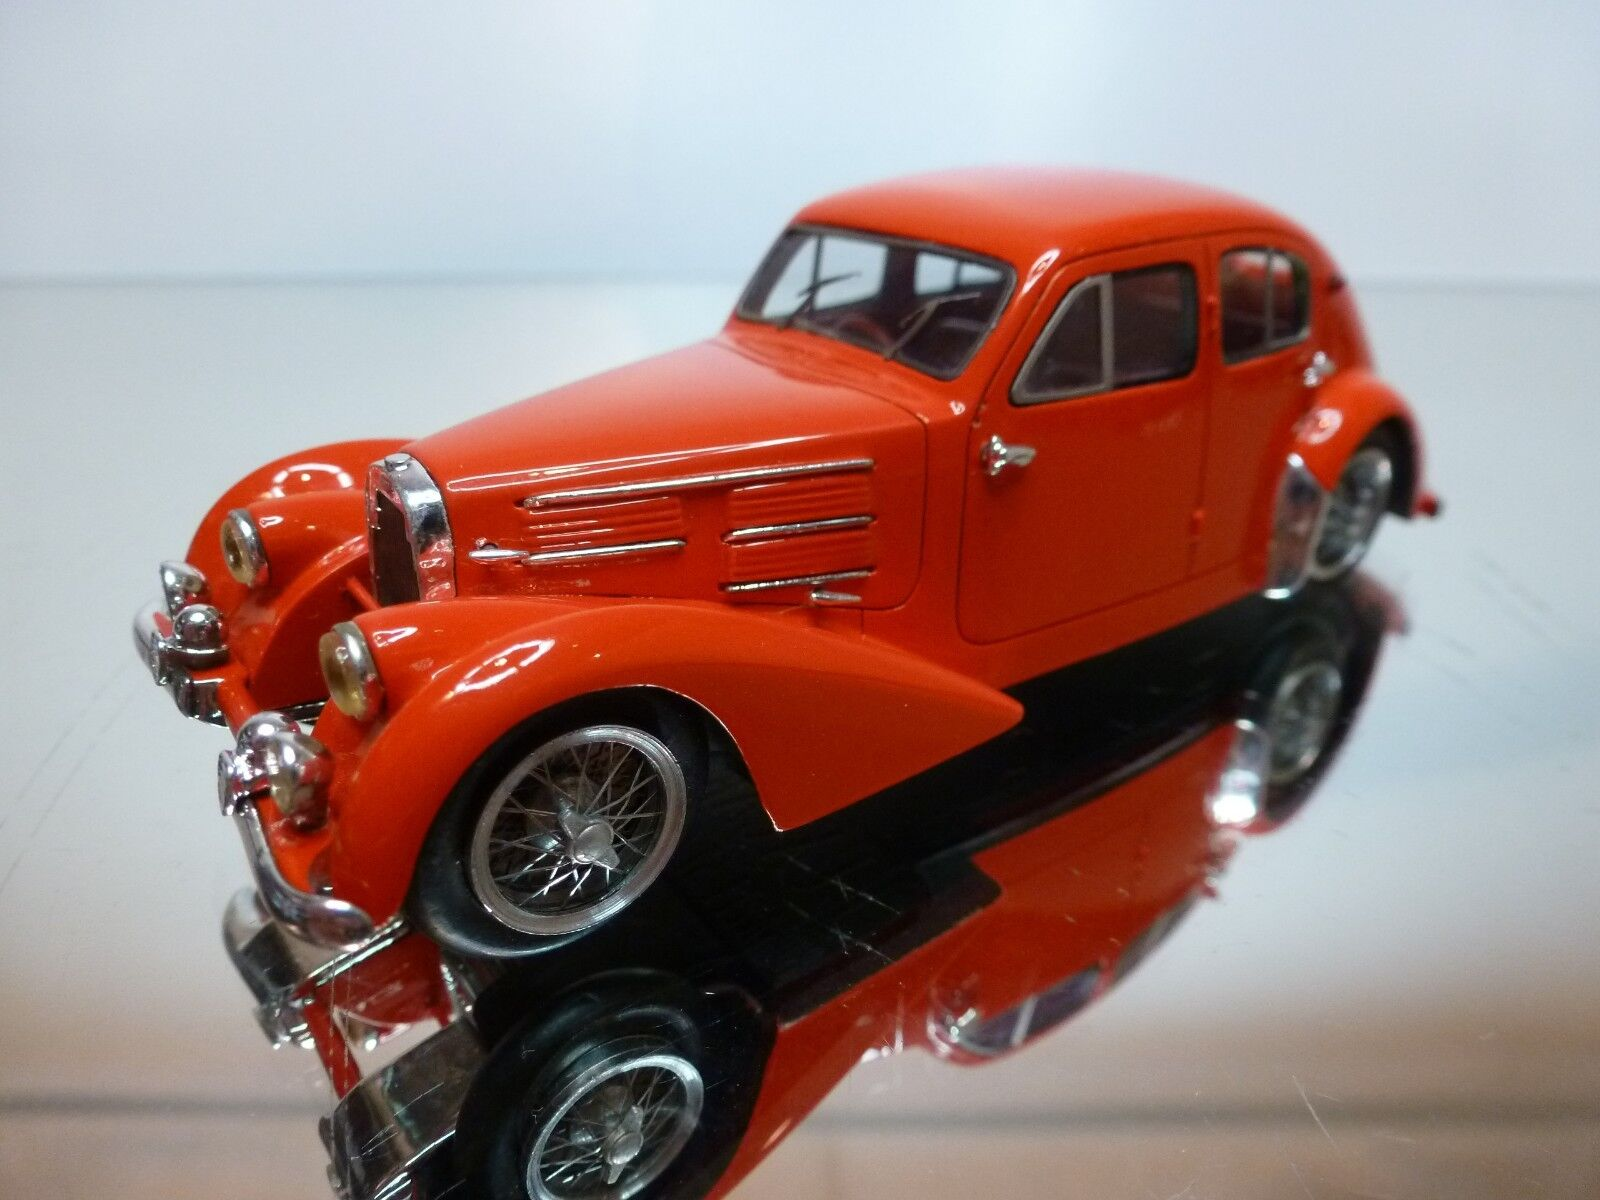 LUXCAR 001 BUGATTI 57 GALIBIER 1938 - rojo 1 43 - EXCELLENT CONDITION - 19